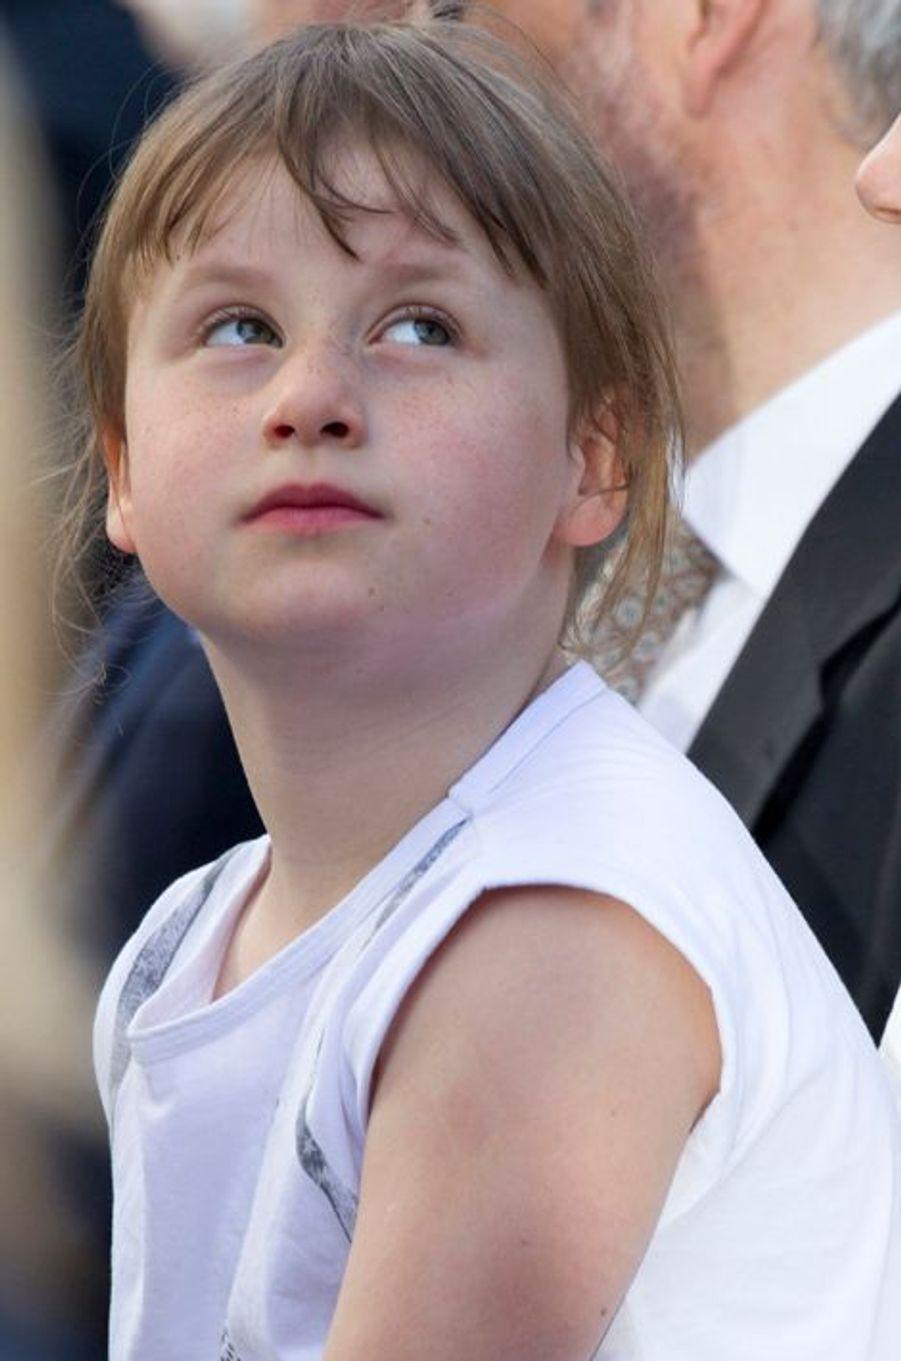 Emma-Tallulah, 3e fille de la princesse Martha-Louise de Norvège, à Oslo le 7 juin 2015